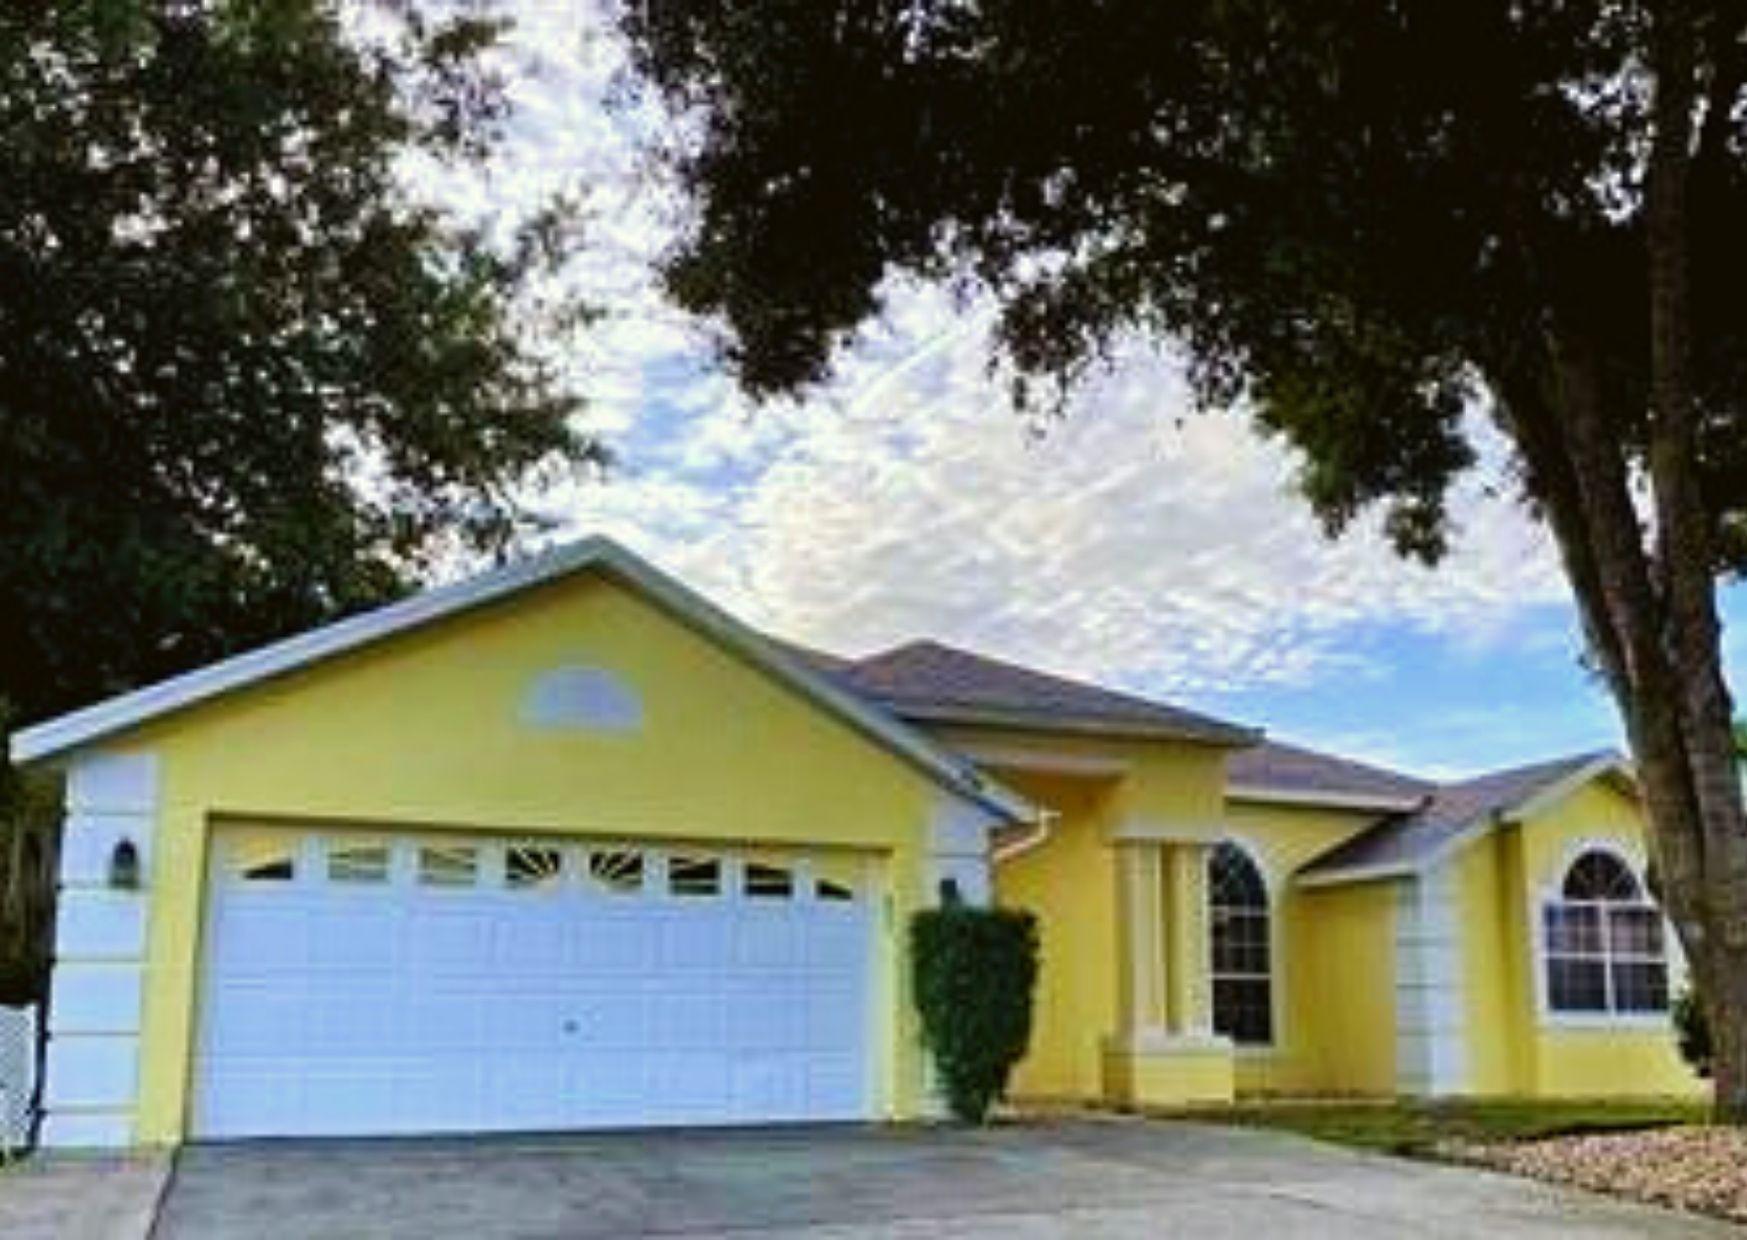 Photo of property: 206 Oak Chase Place Davenport, FL 33896